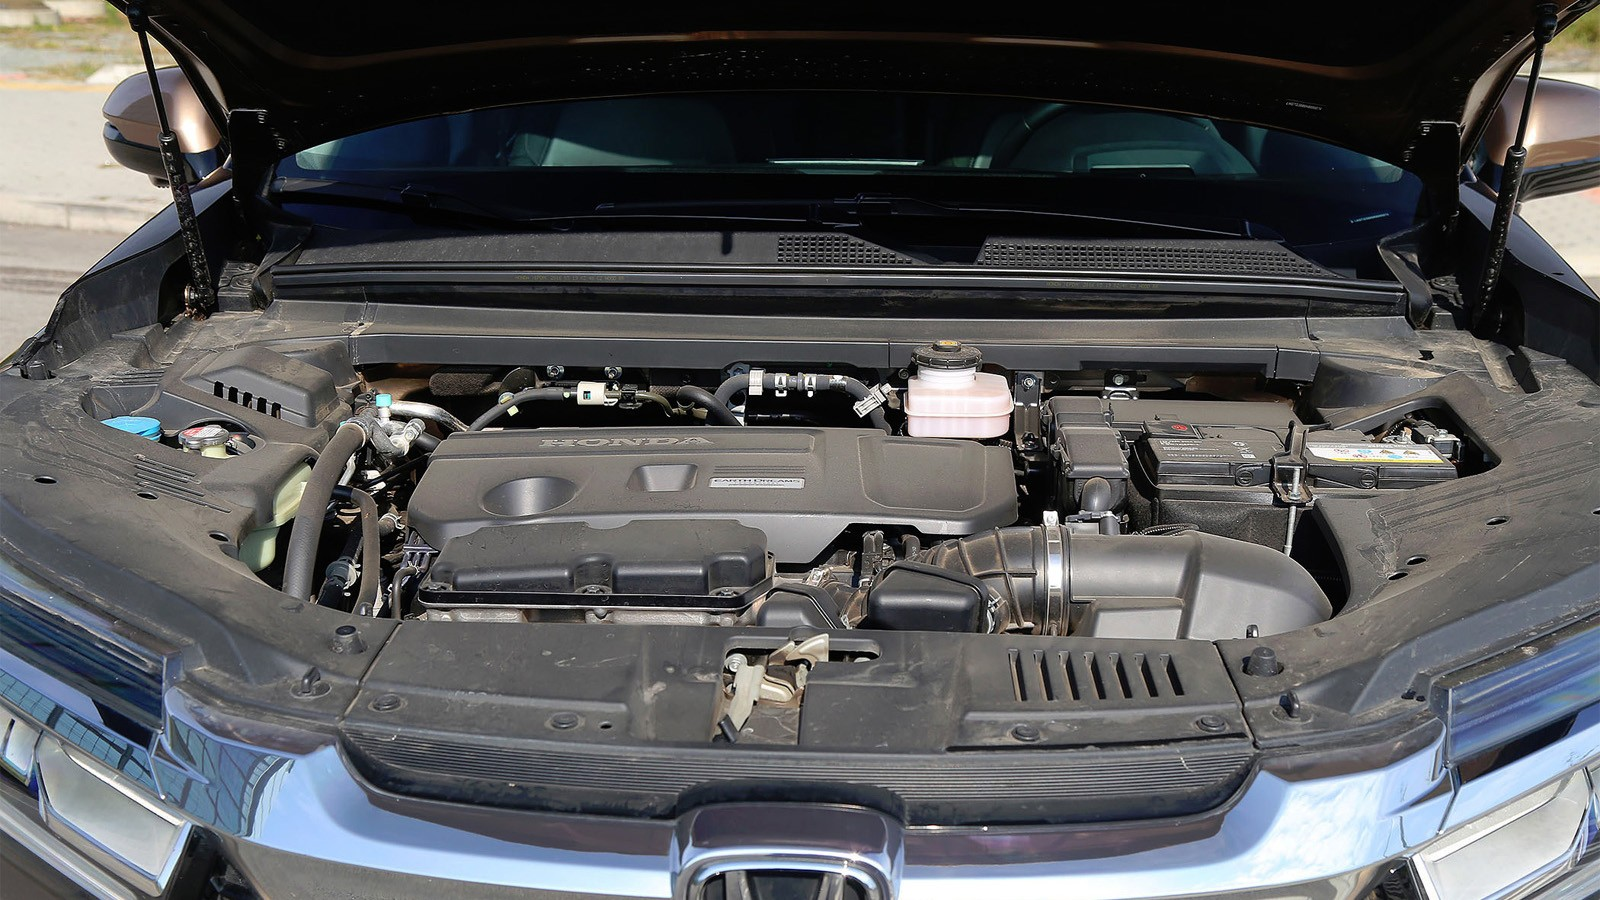 2019 Honda Avancier foto, dvigatel', motor, tehnicheskie harakteristiki, cena, data vyhoda